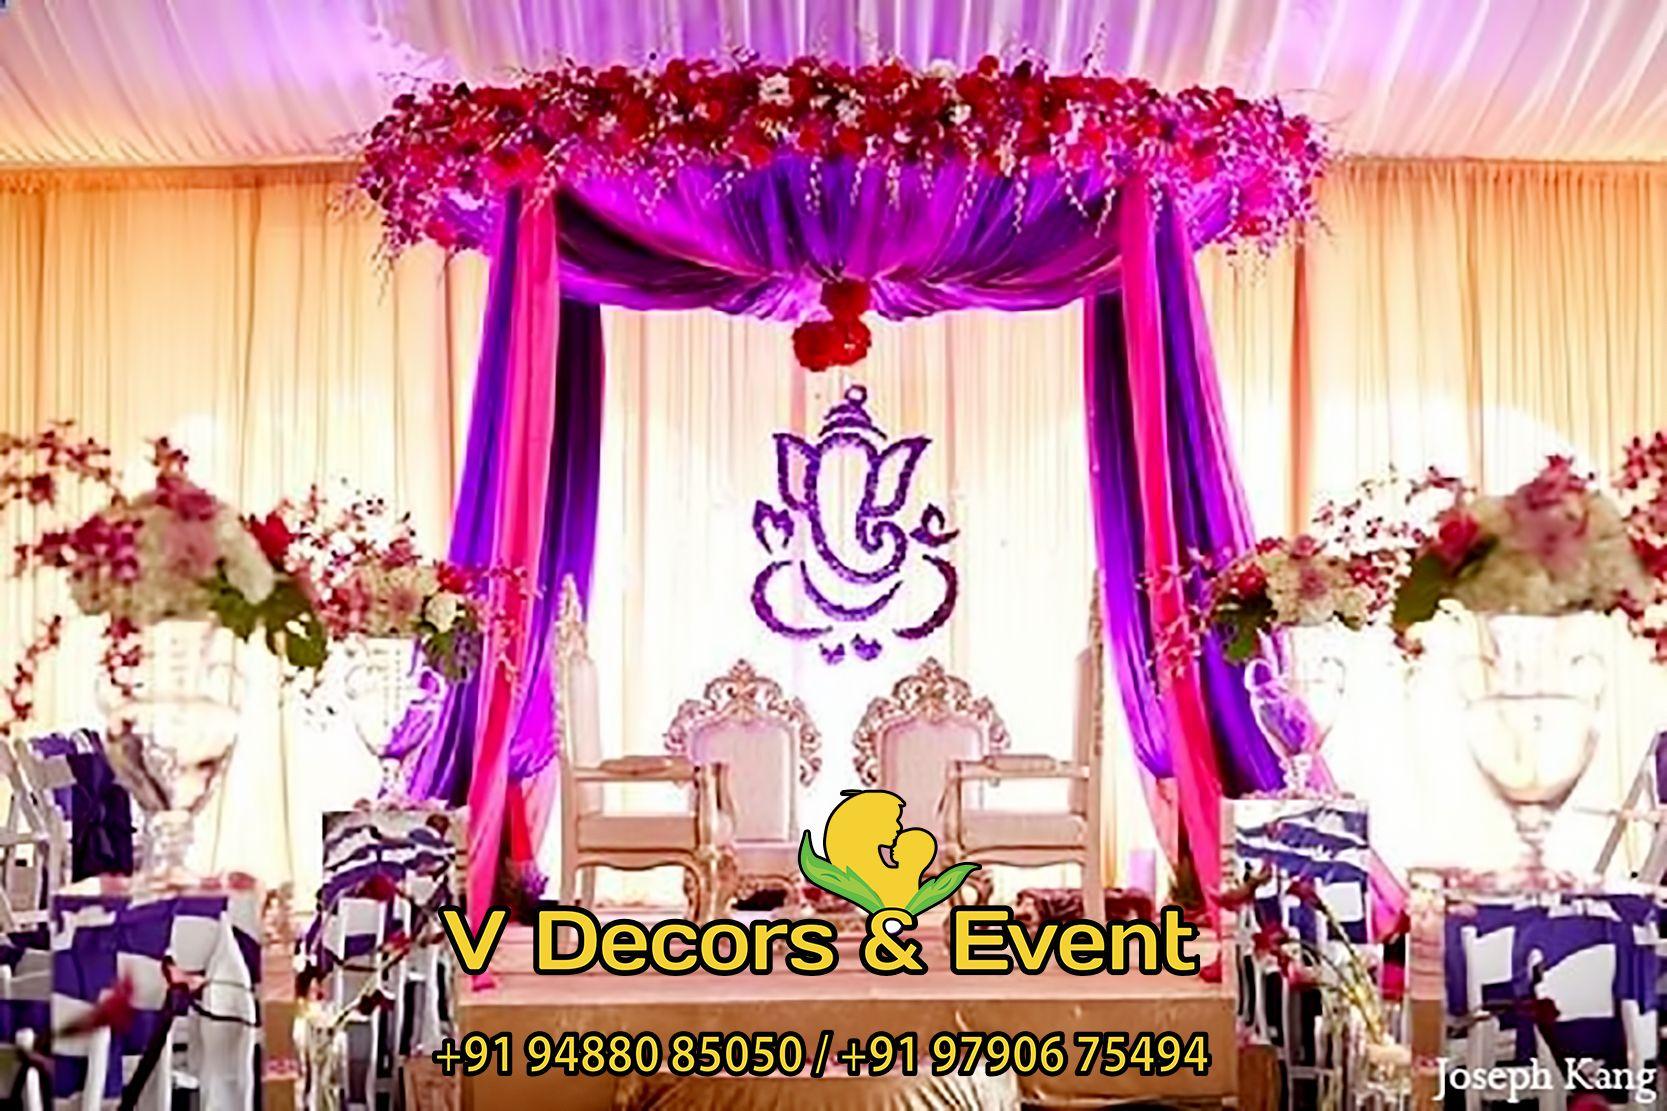 Indian Wedding Ceremony Decor Mandap Purple Pink In Chicago Illinois By Joseph Kang